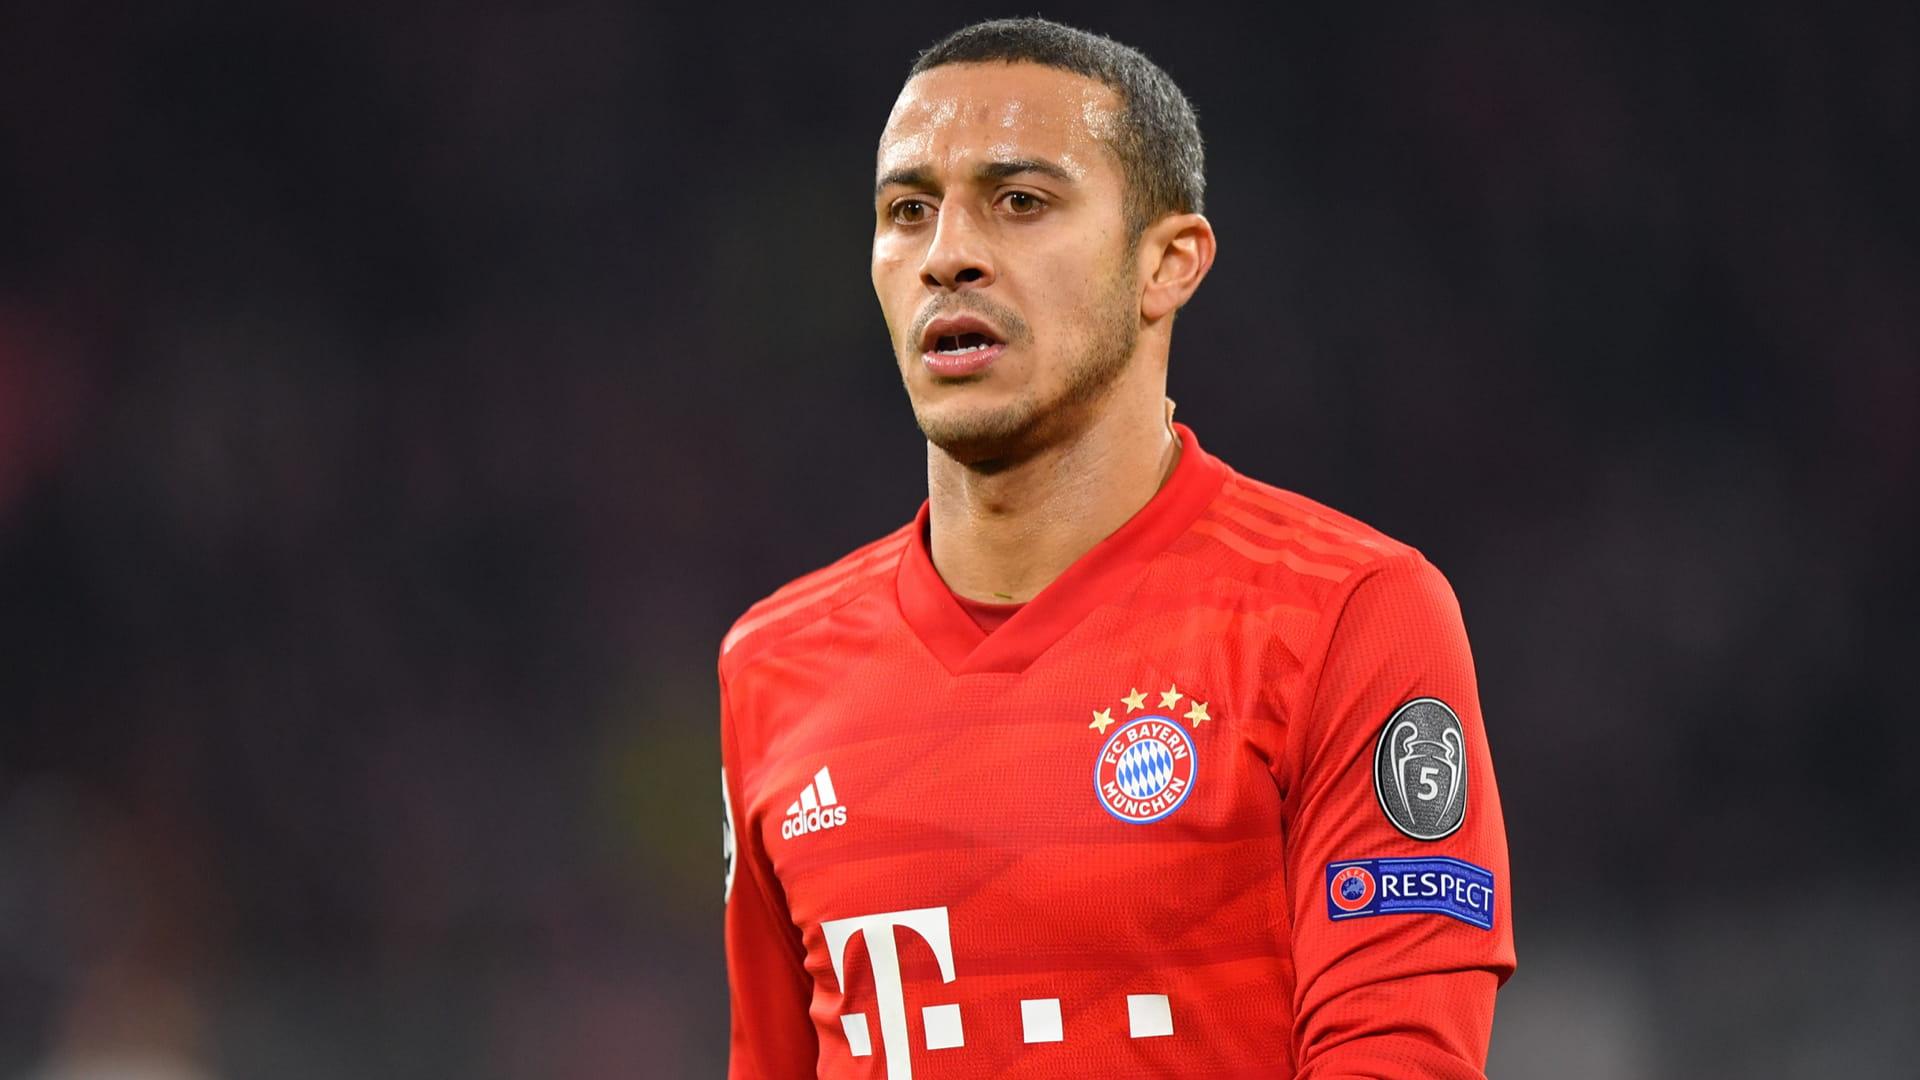 Bayern Monaco, rinnovo lontano per Thiago Alcantara: sarà addio?